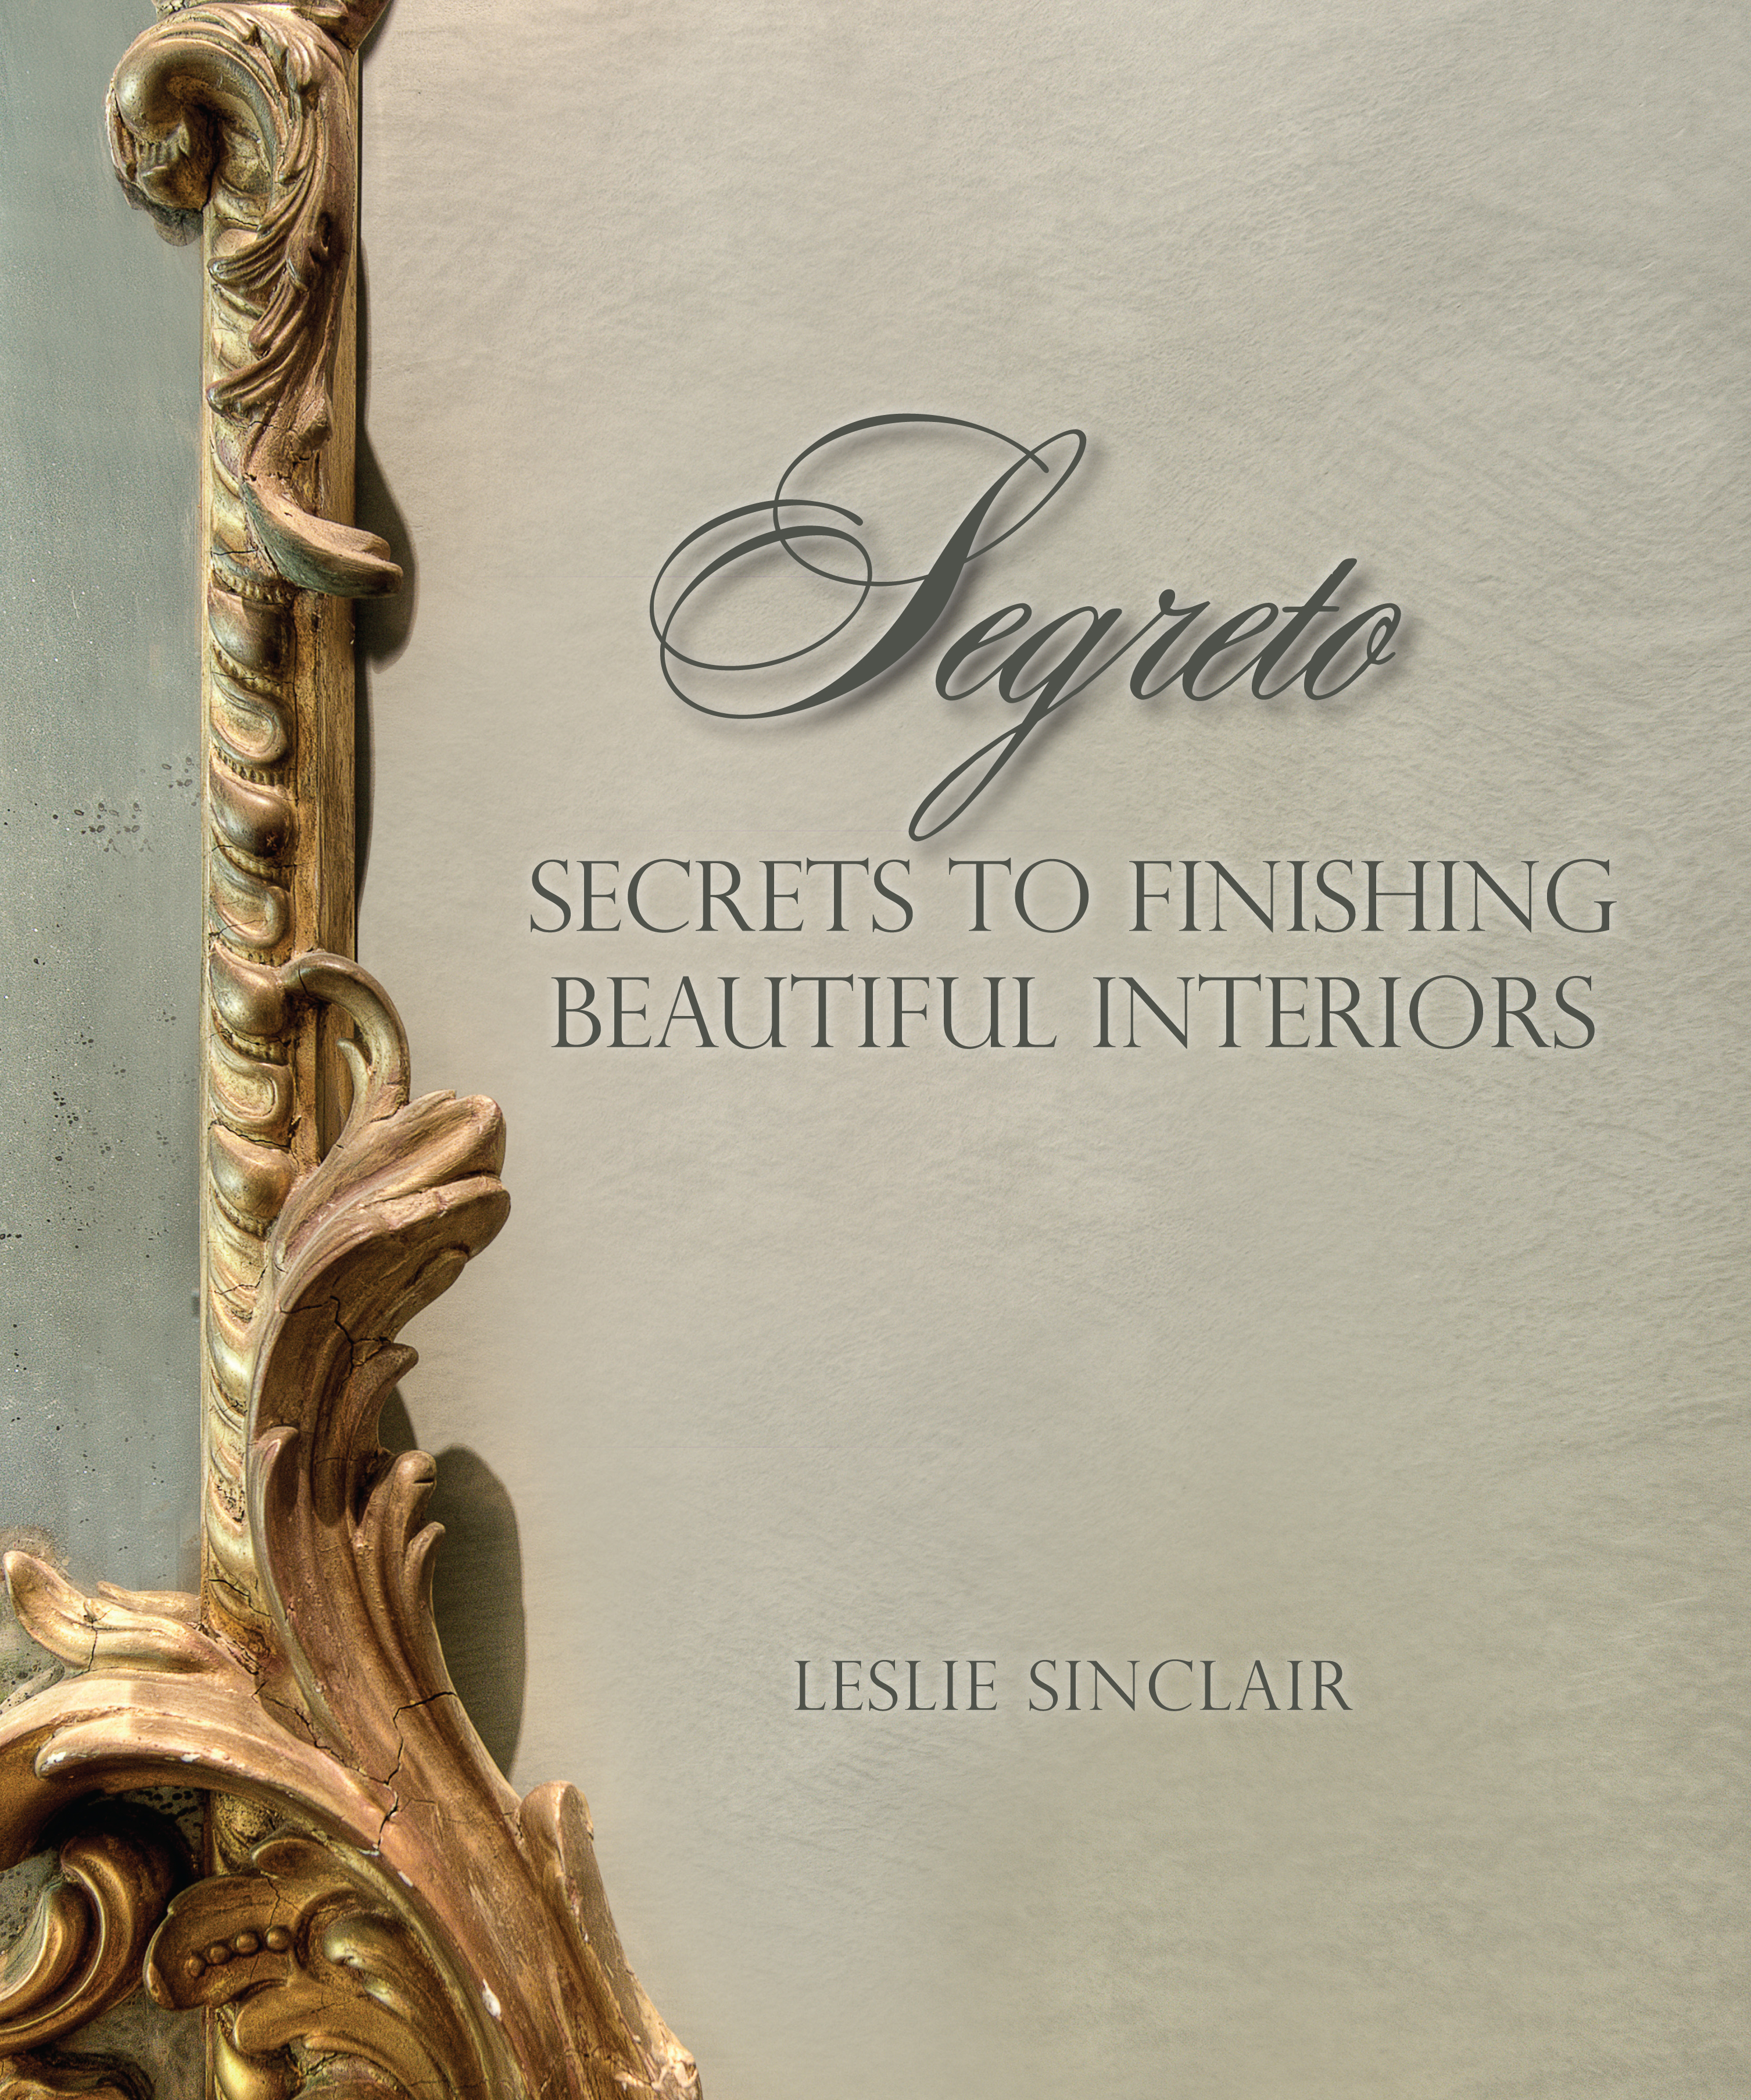 A Farewell to Segreto: Secrets to Finishing Beautiful Interiors